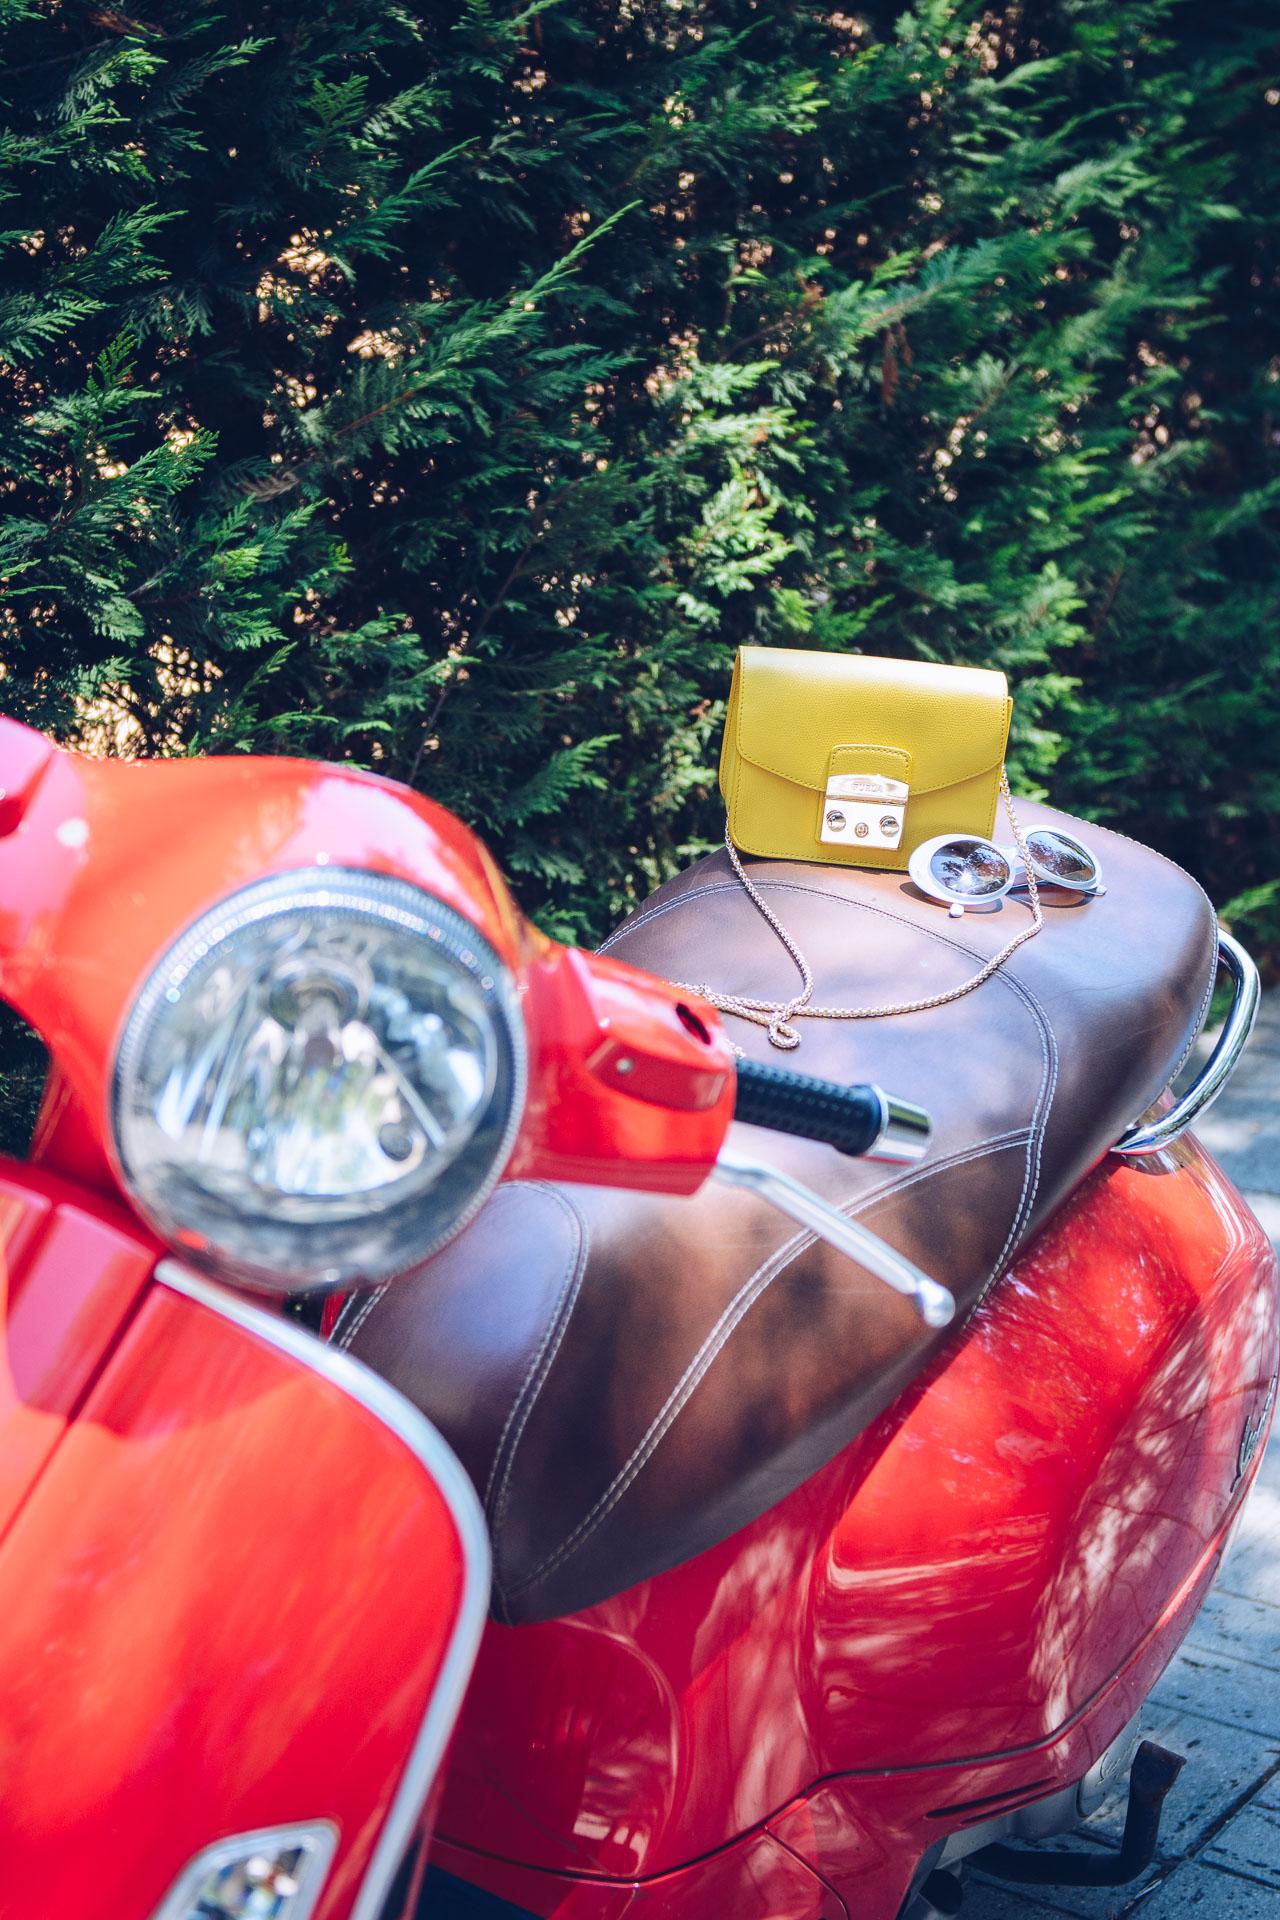 Vespa scooter furla handbag